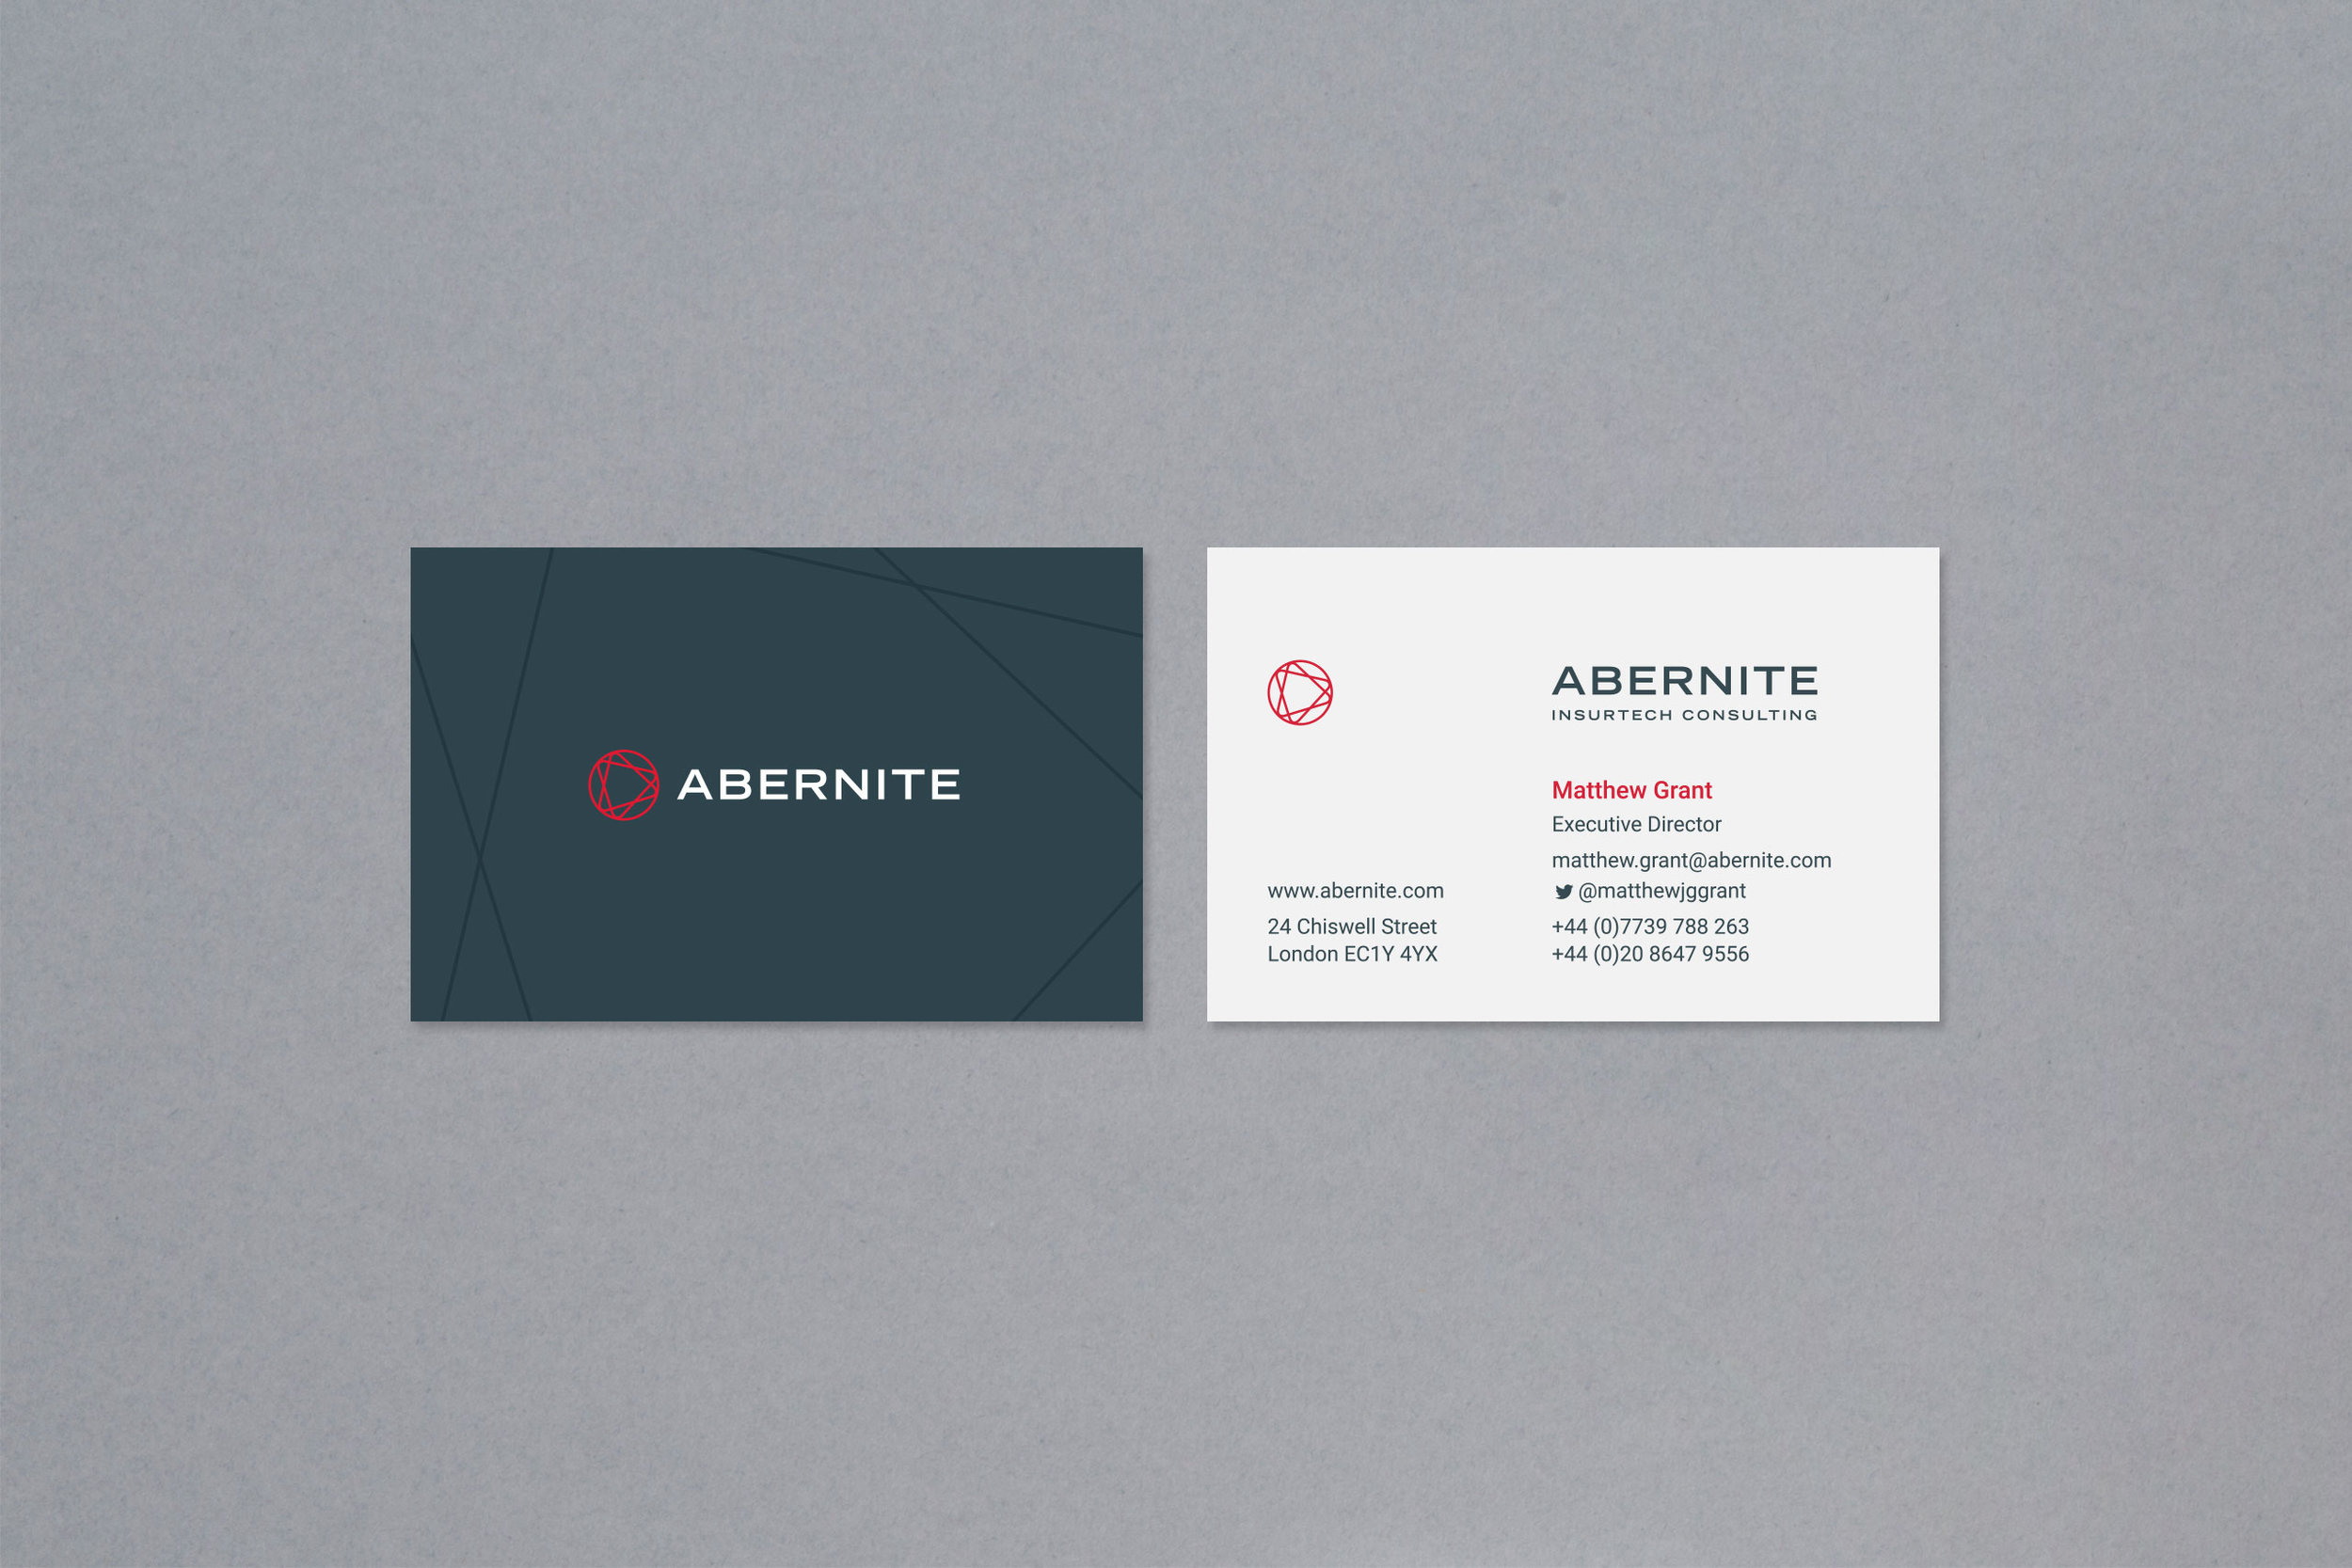 Abernite-Canvas-4.jpg